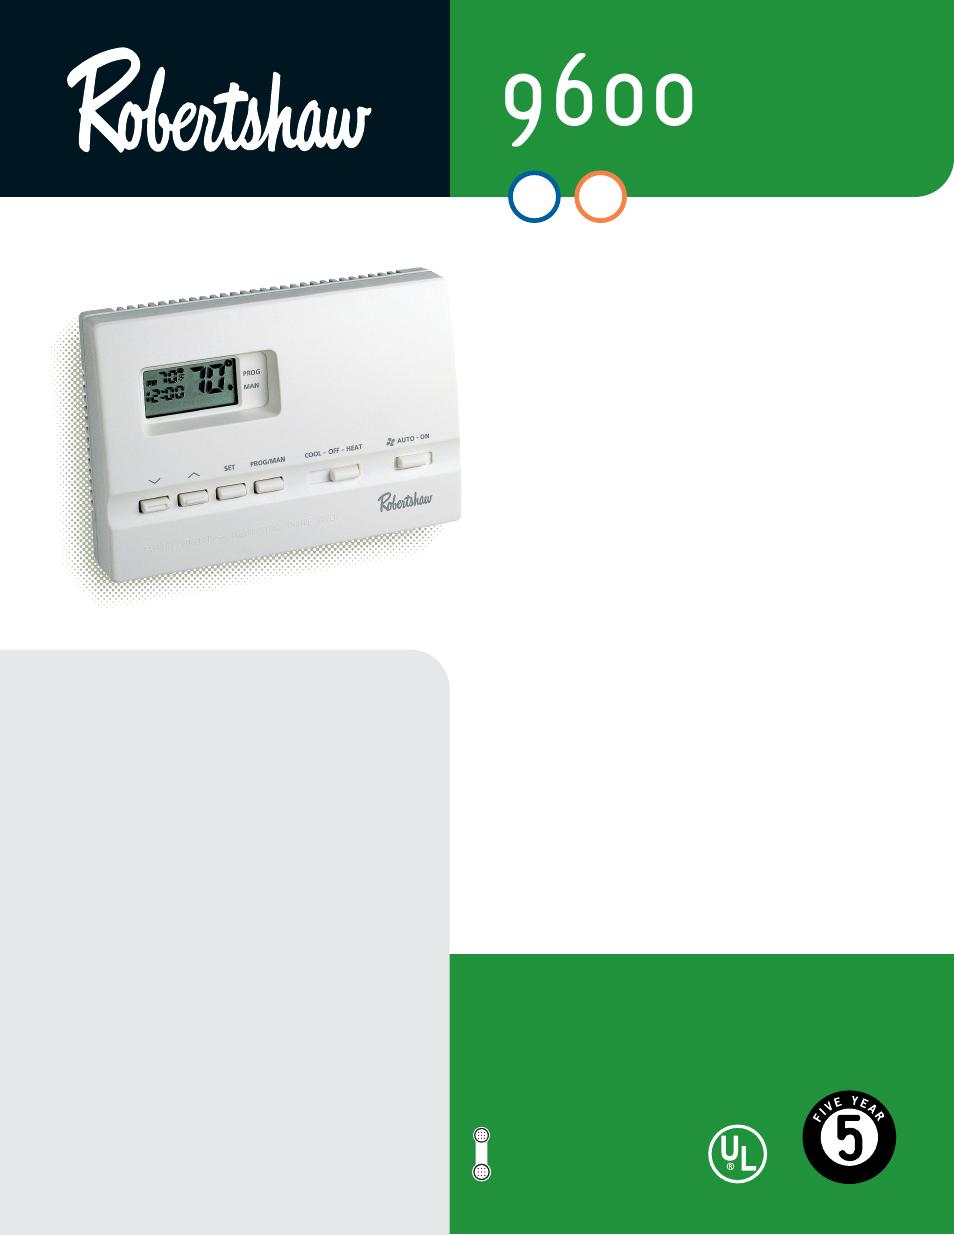 Robertshaw 9600 User Manual